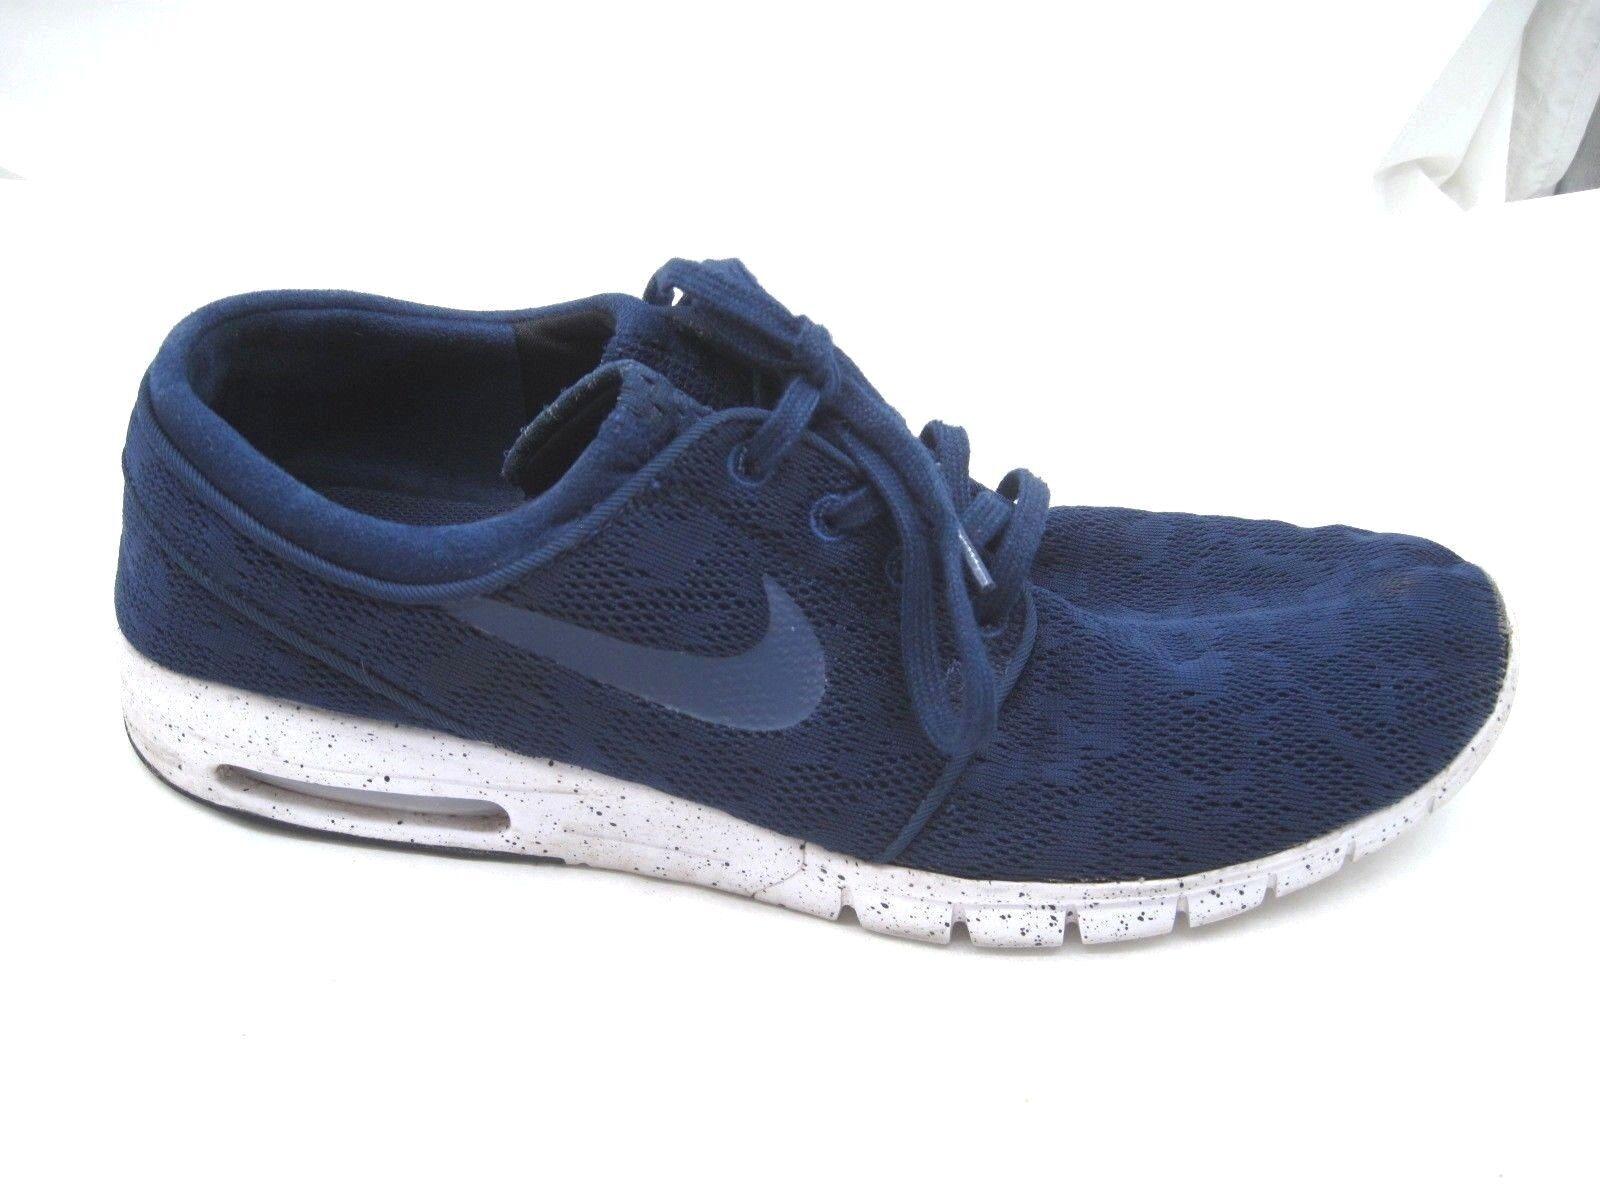 Nike stefan janoski blaue mens skateboard - skate skate skate - sportschuhe sz 11.5m 2015 034e61